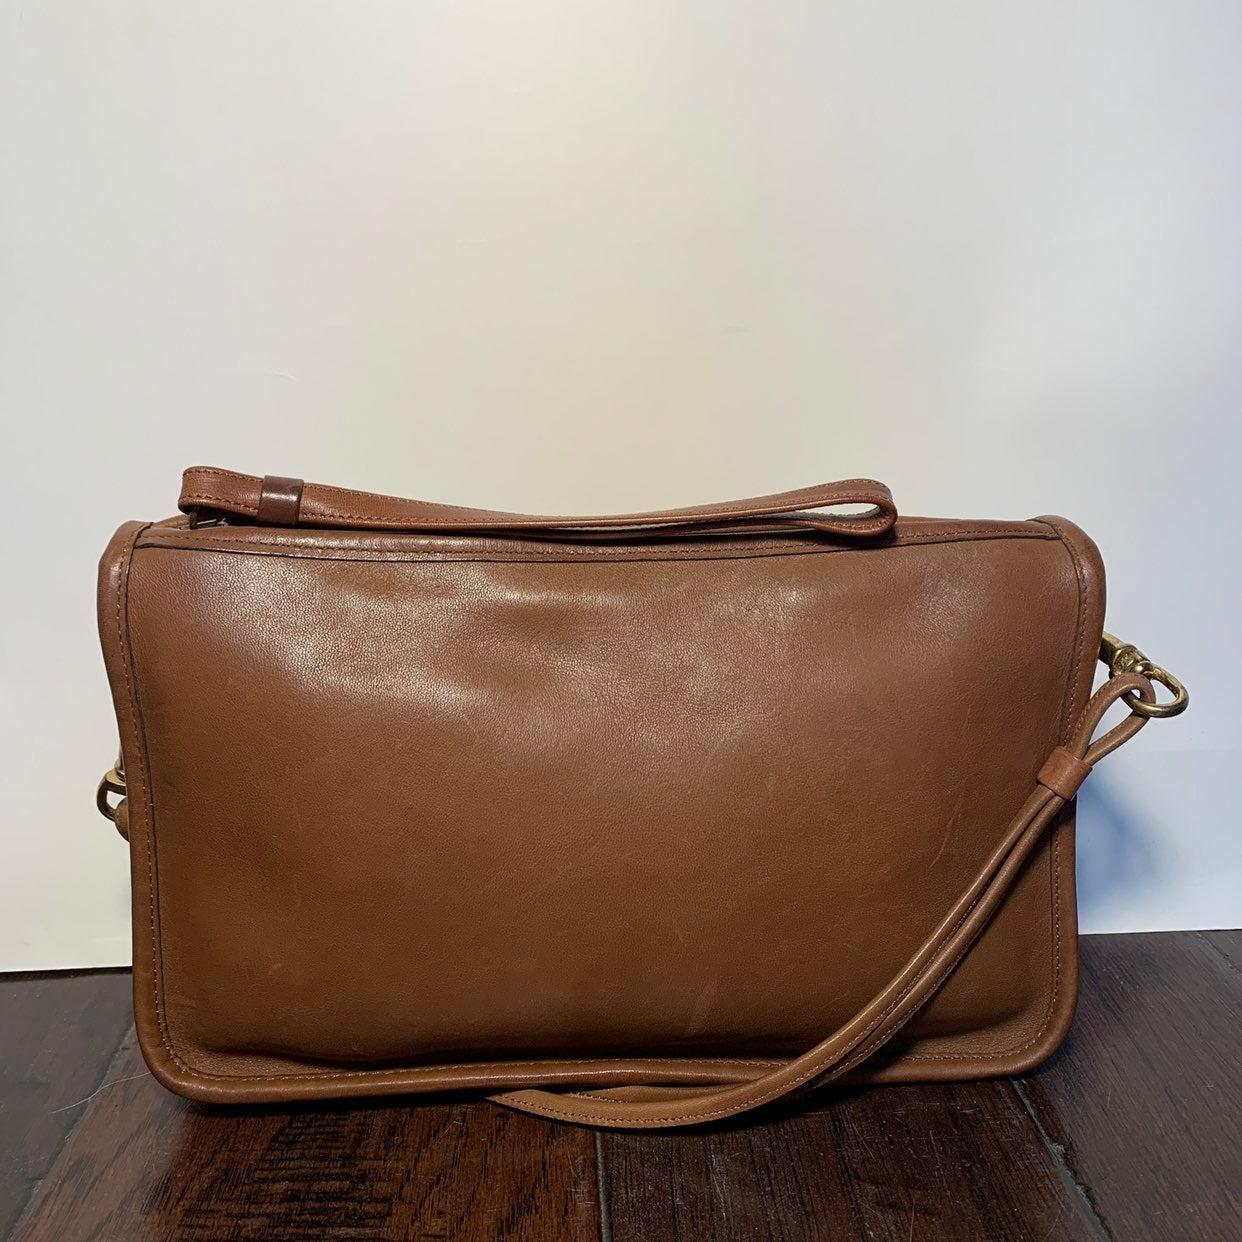 Vintage 80's Coach Leather Crossbody Bag